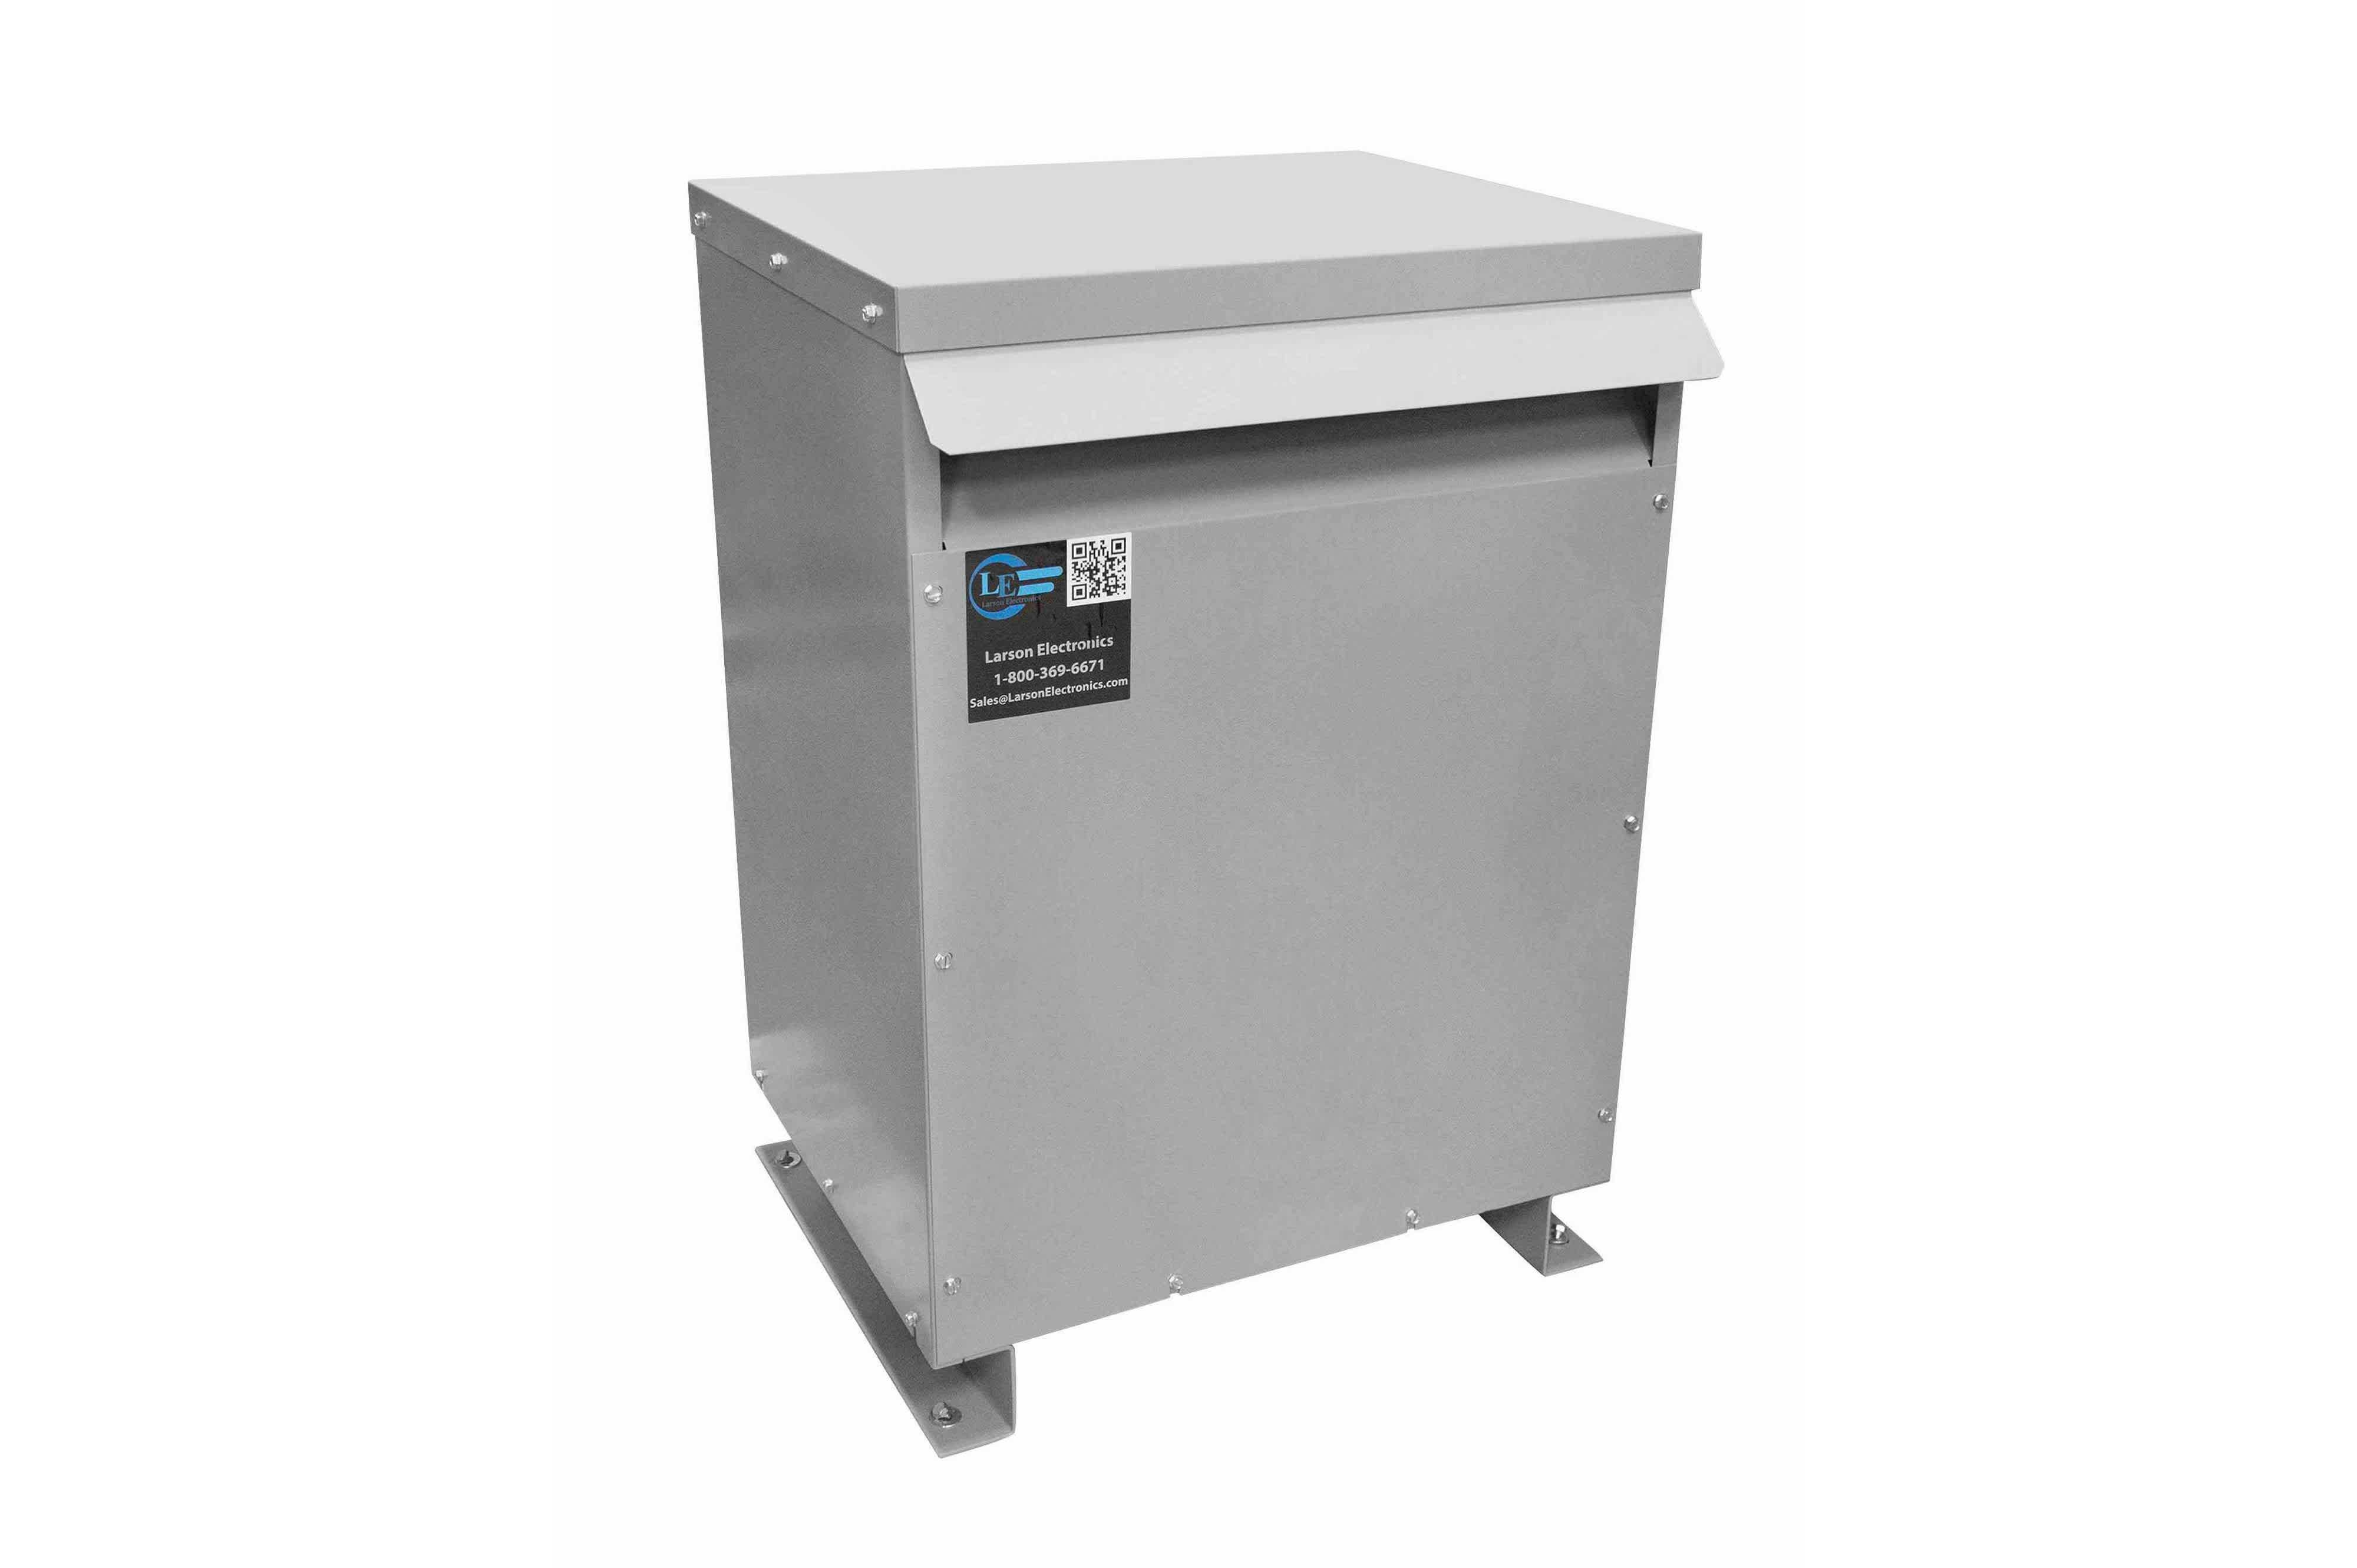 1000 kVA 3PH Isolation Transformer, 208V Wye Primary, 240V Delta Secondary, N3R, Ventilated, 60 Hz